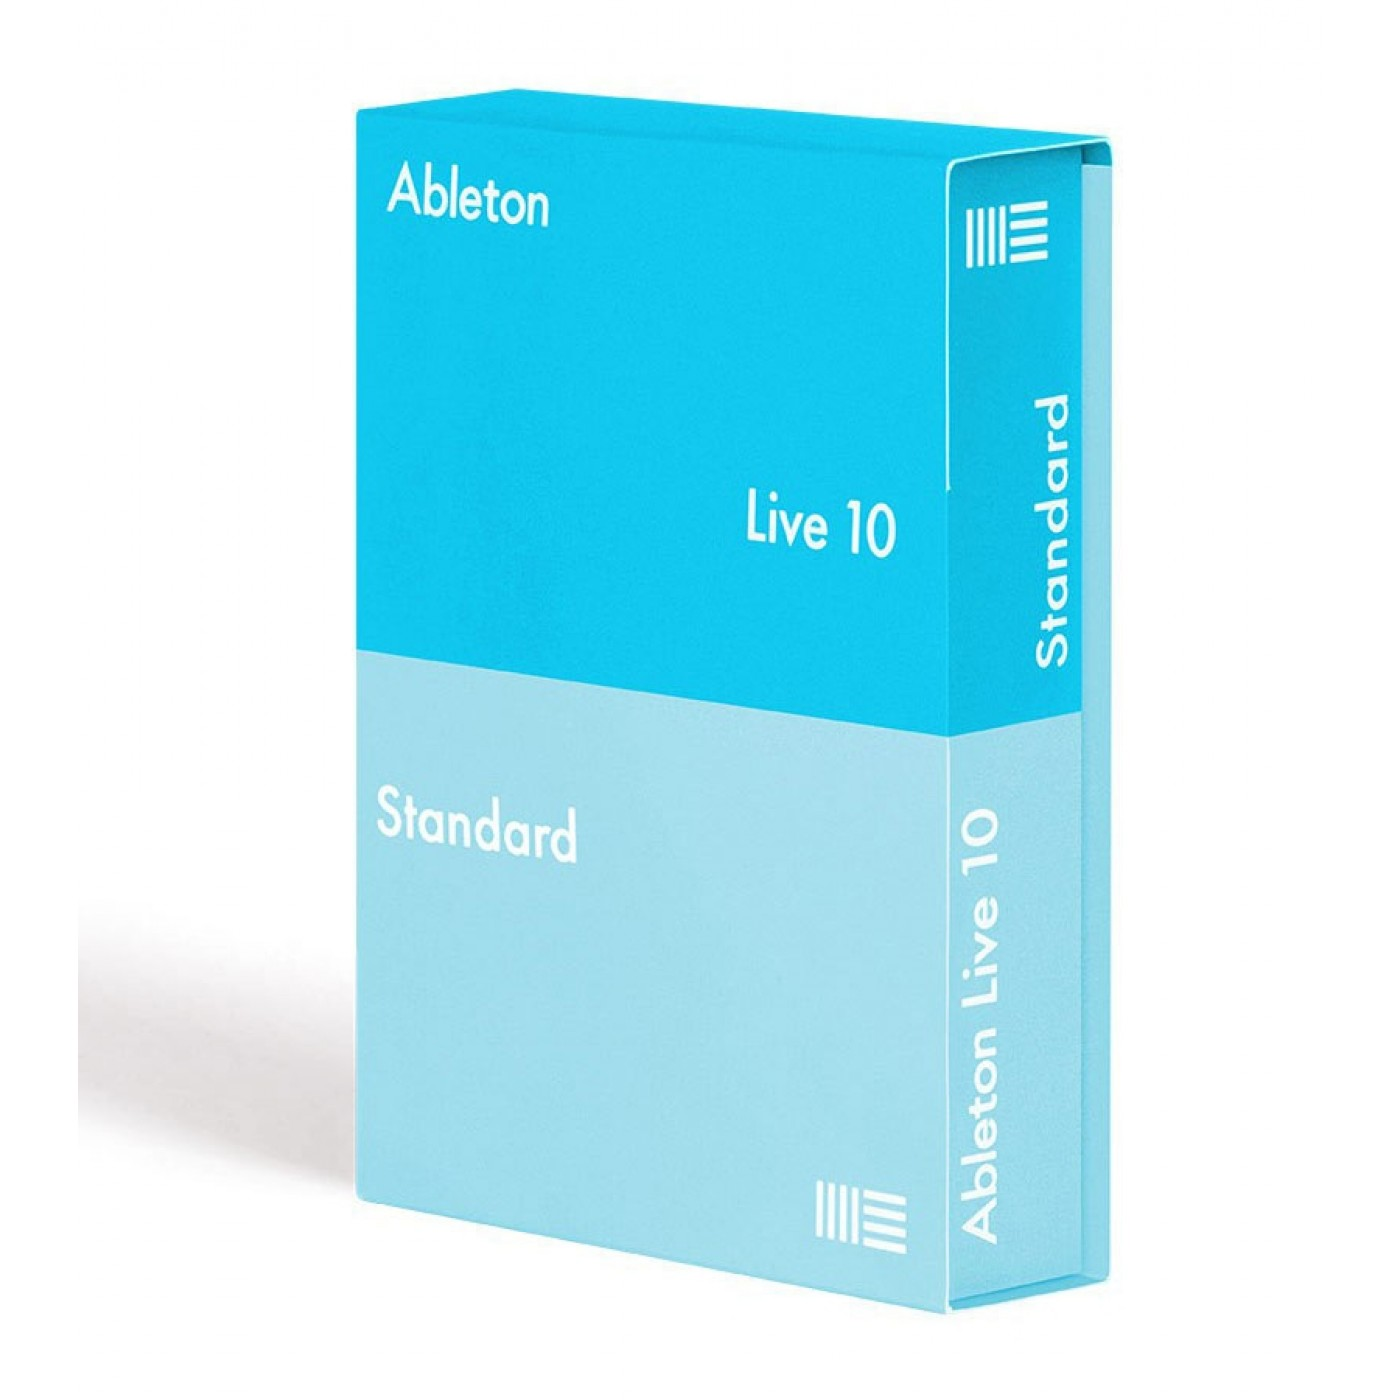 Ableton LIVE 10 Actualizacion desde Live Intro